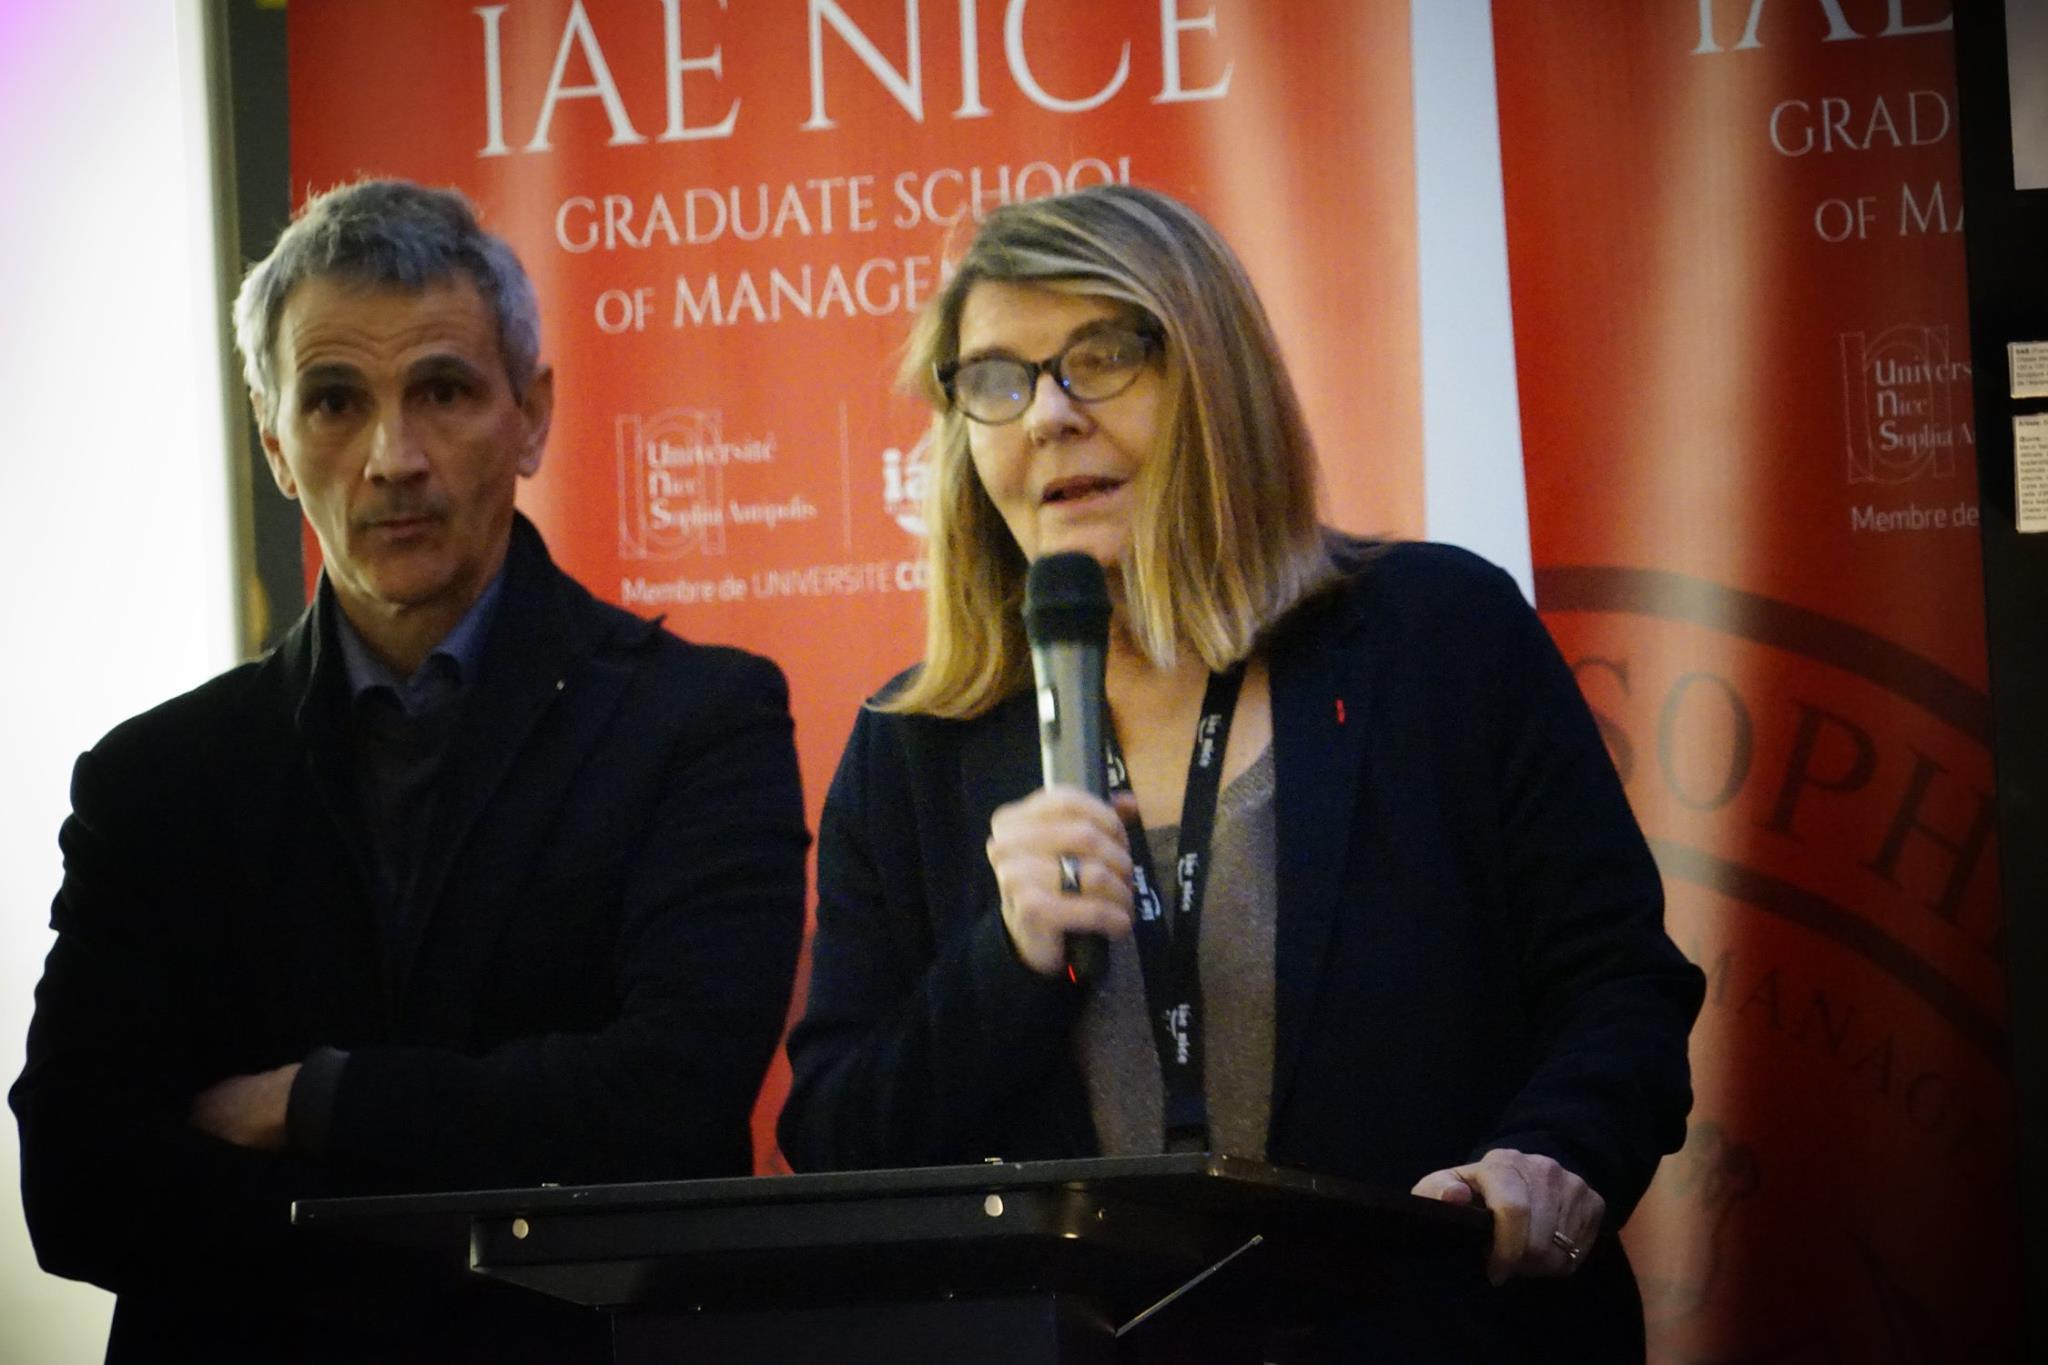 Directrice de l'IAE, Nadine Tournois